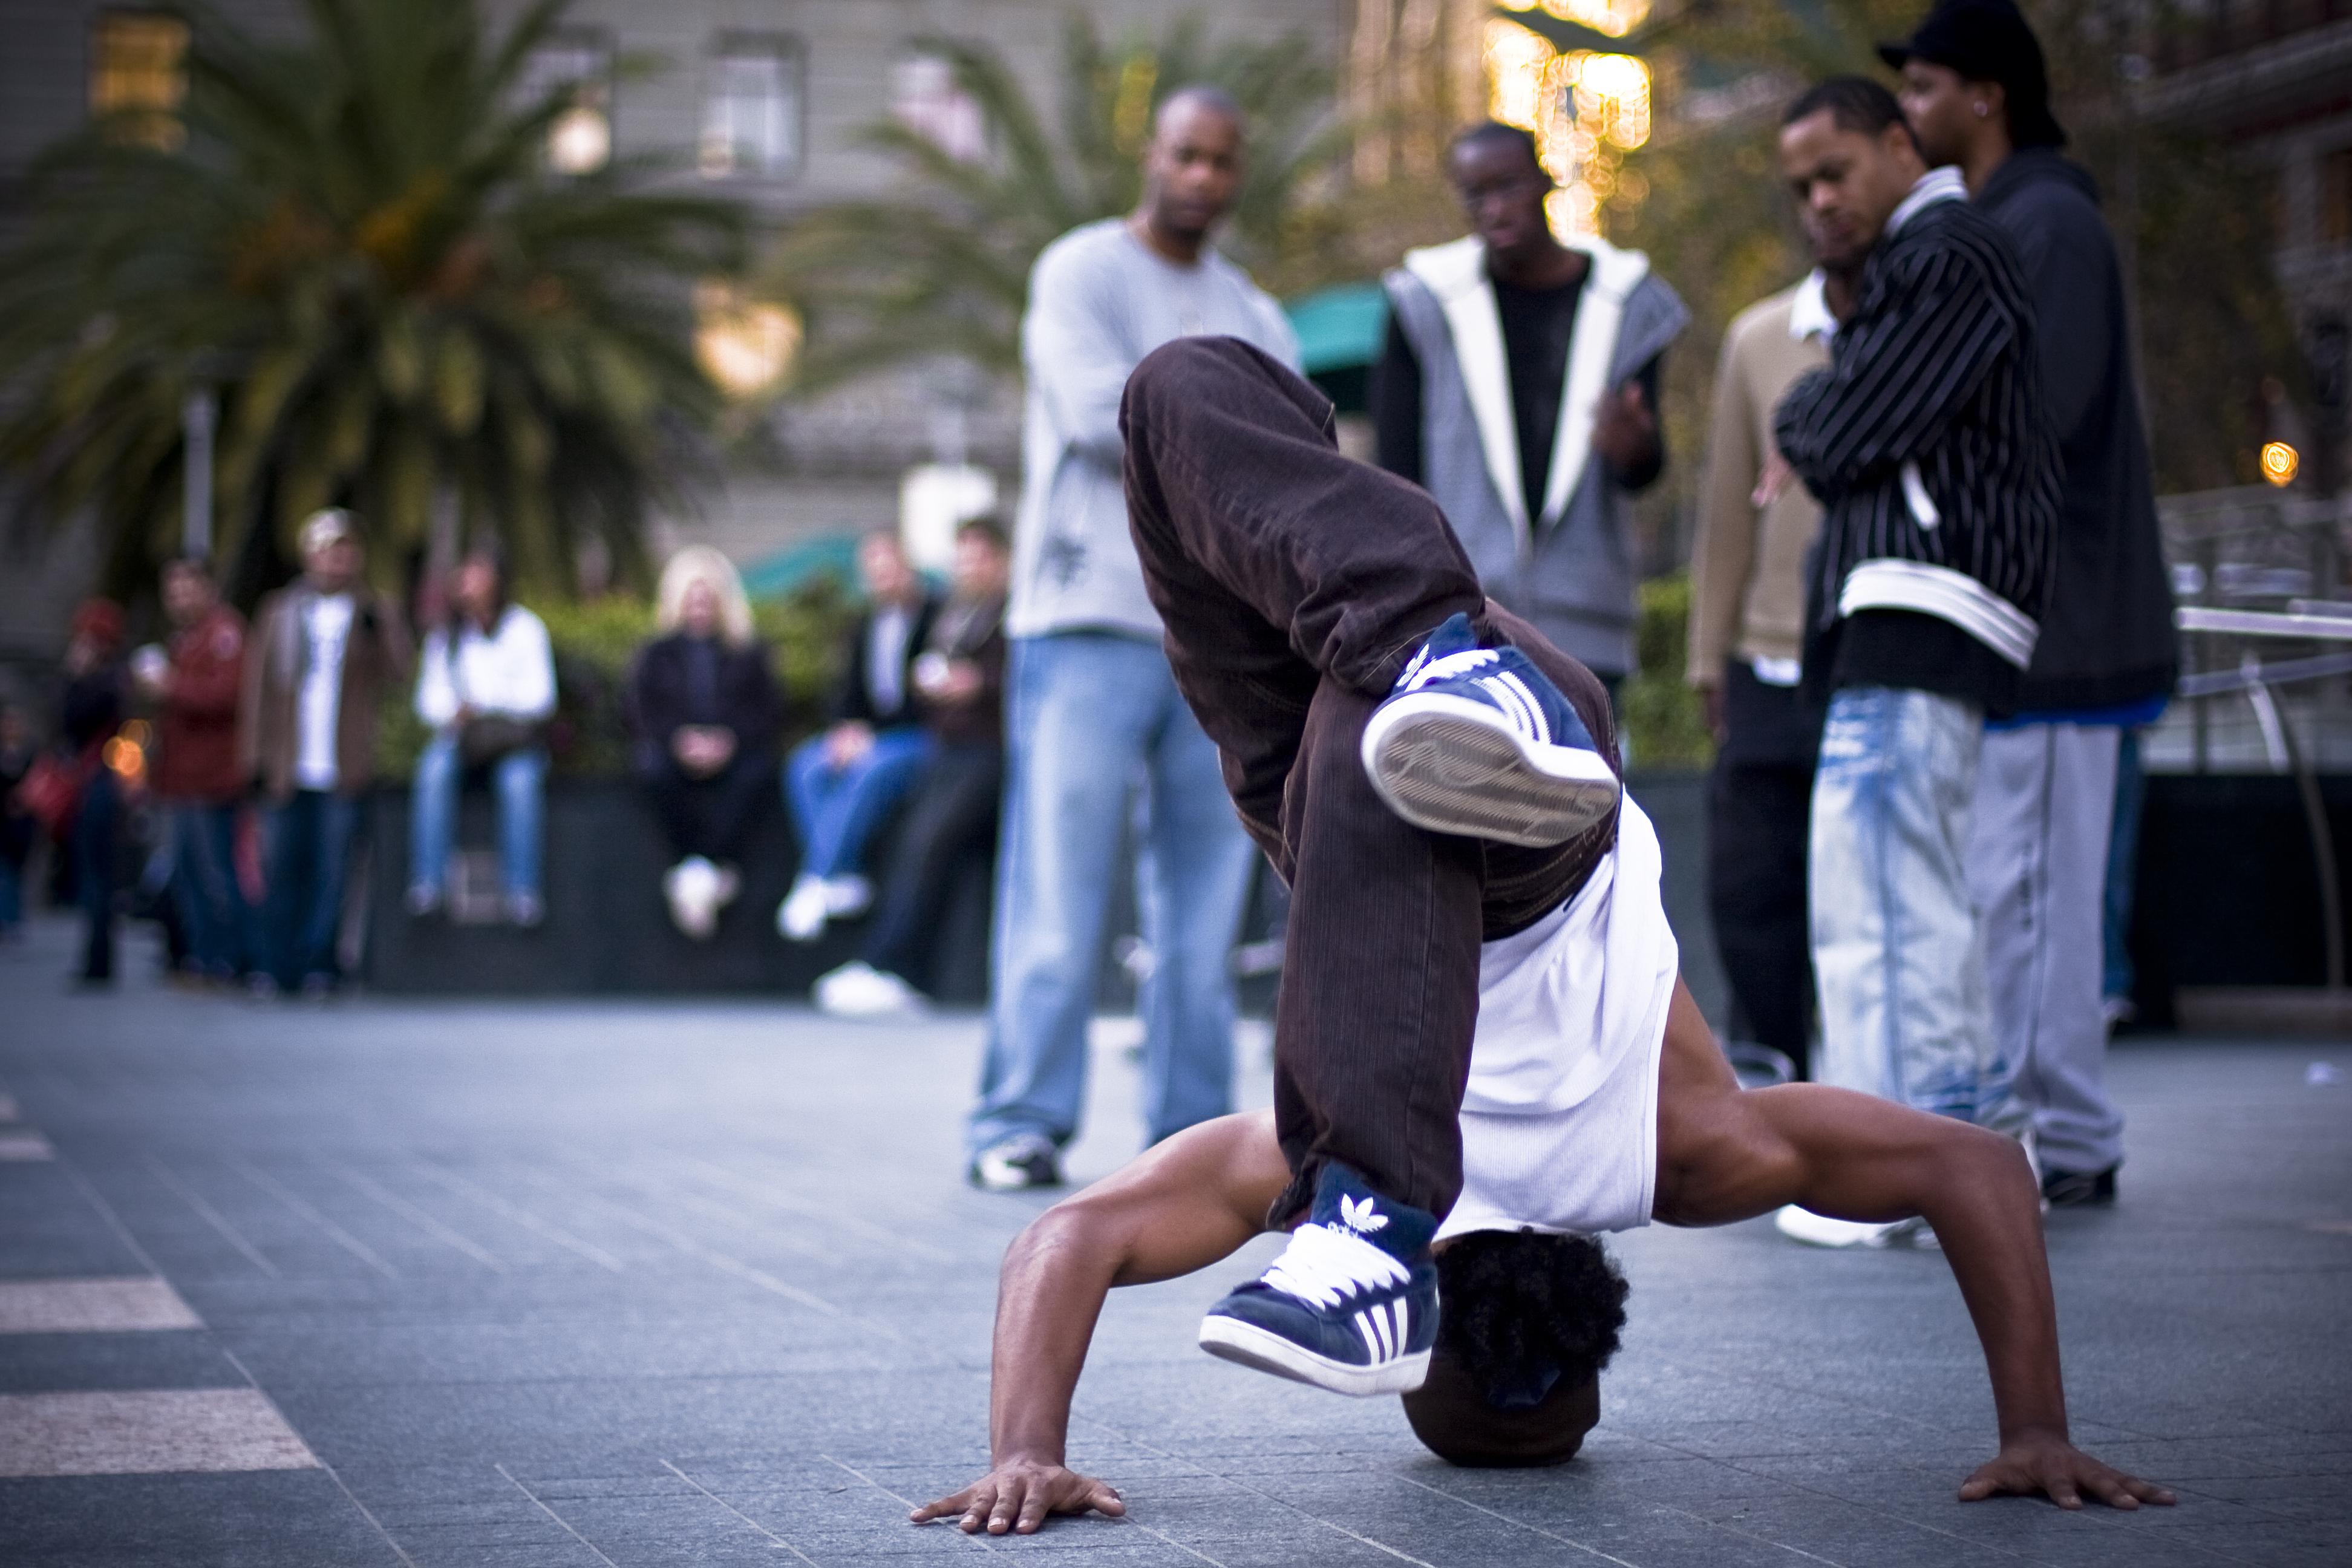 Black Kid Dancing Like Michael Jackson